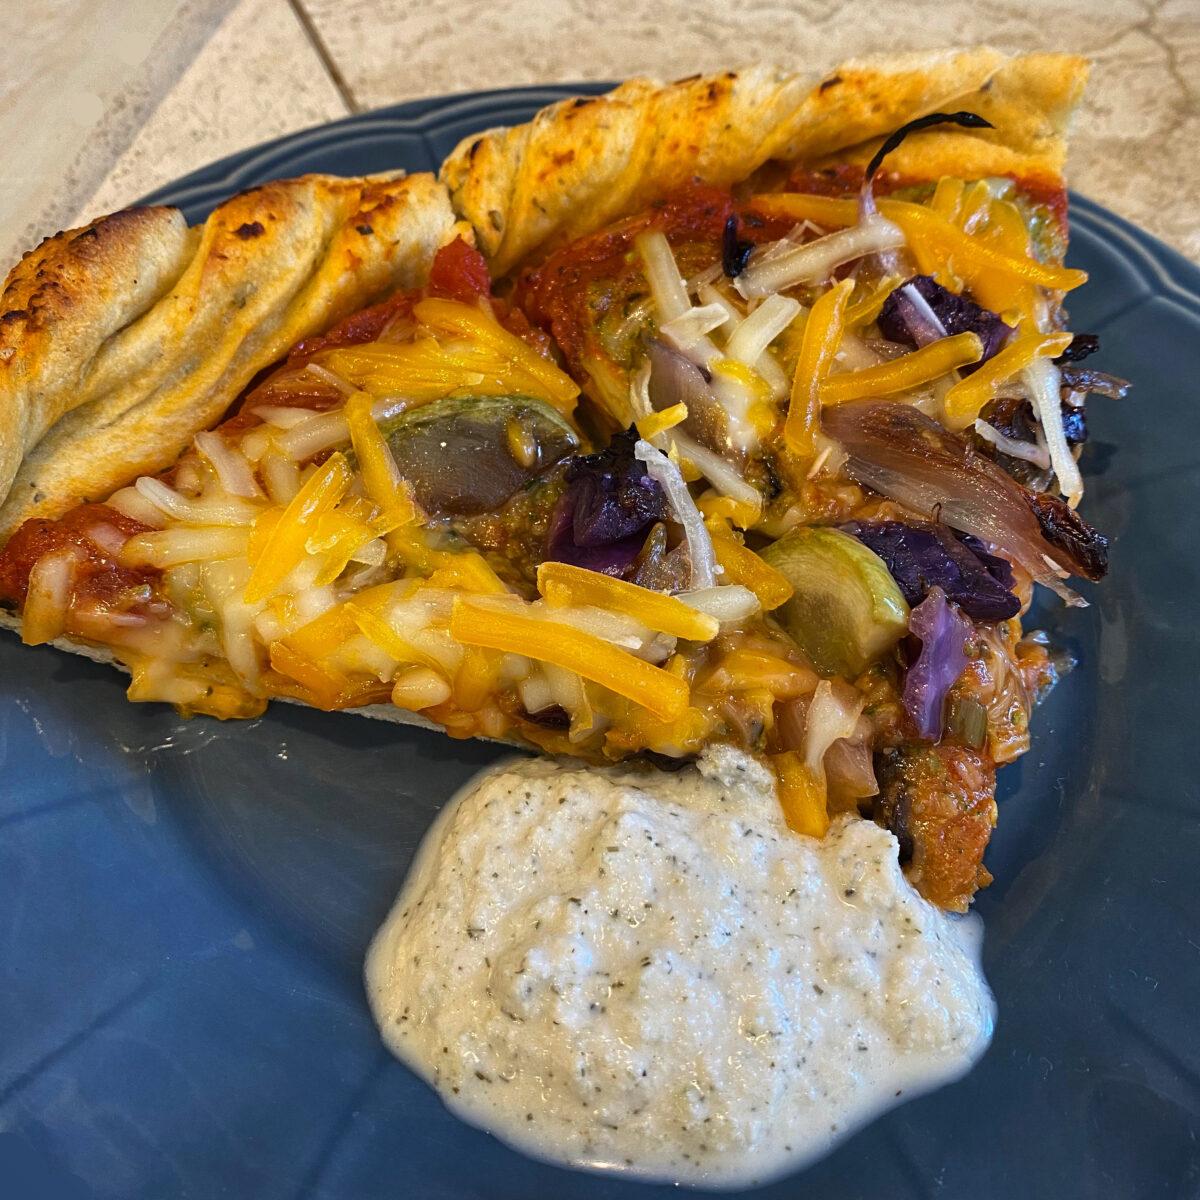 McGeeza's Vegan Pizzas with McGyro's Vegan Tzatziki Sauce